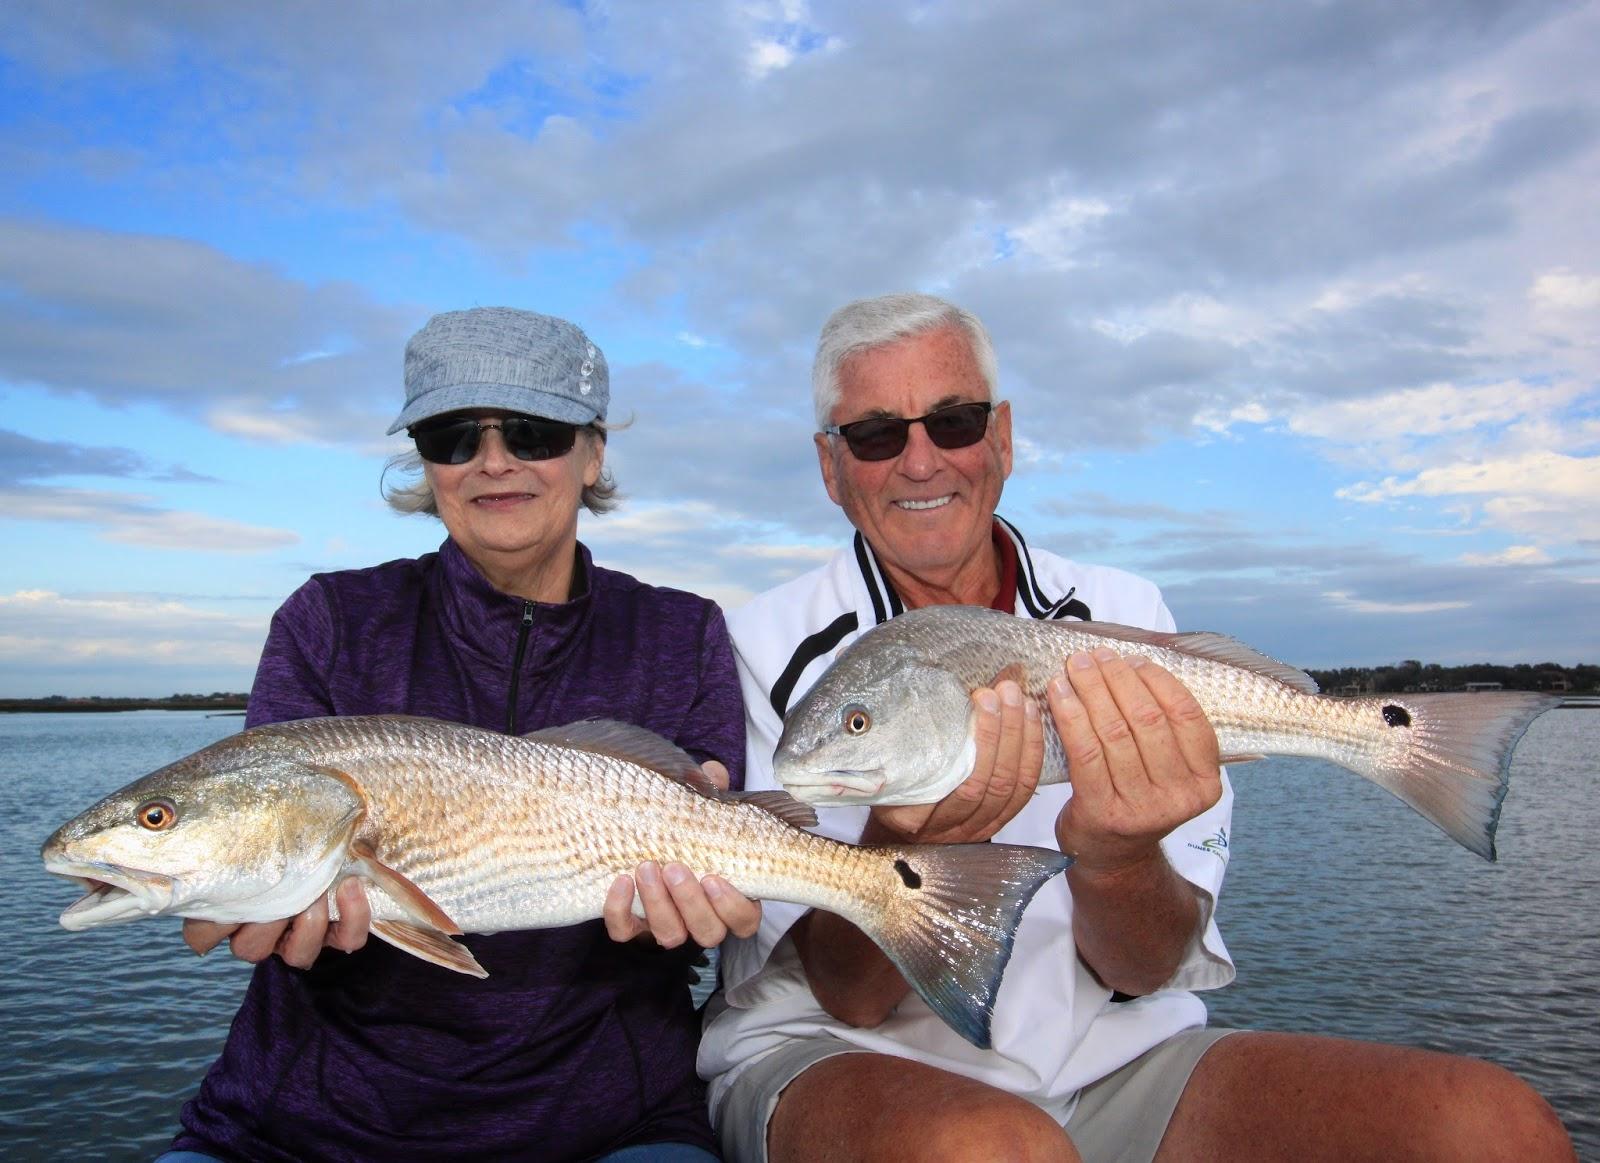 St augustine palm coast fishing report december 14th for St augustine fishing report